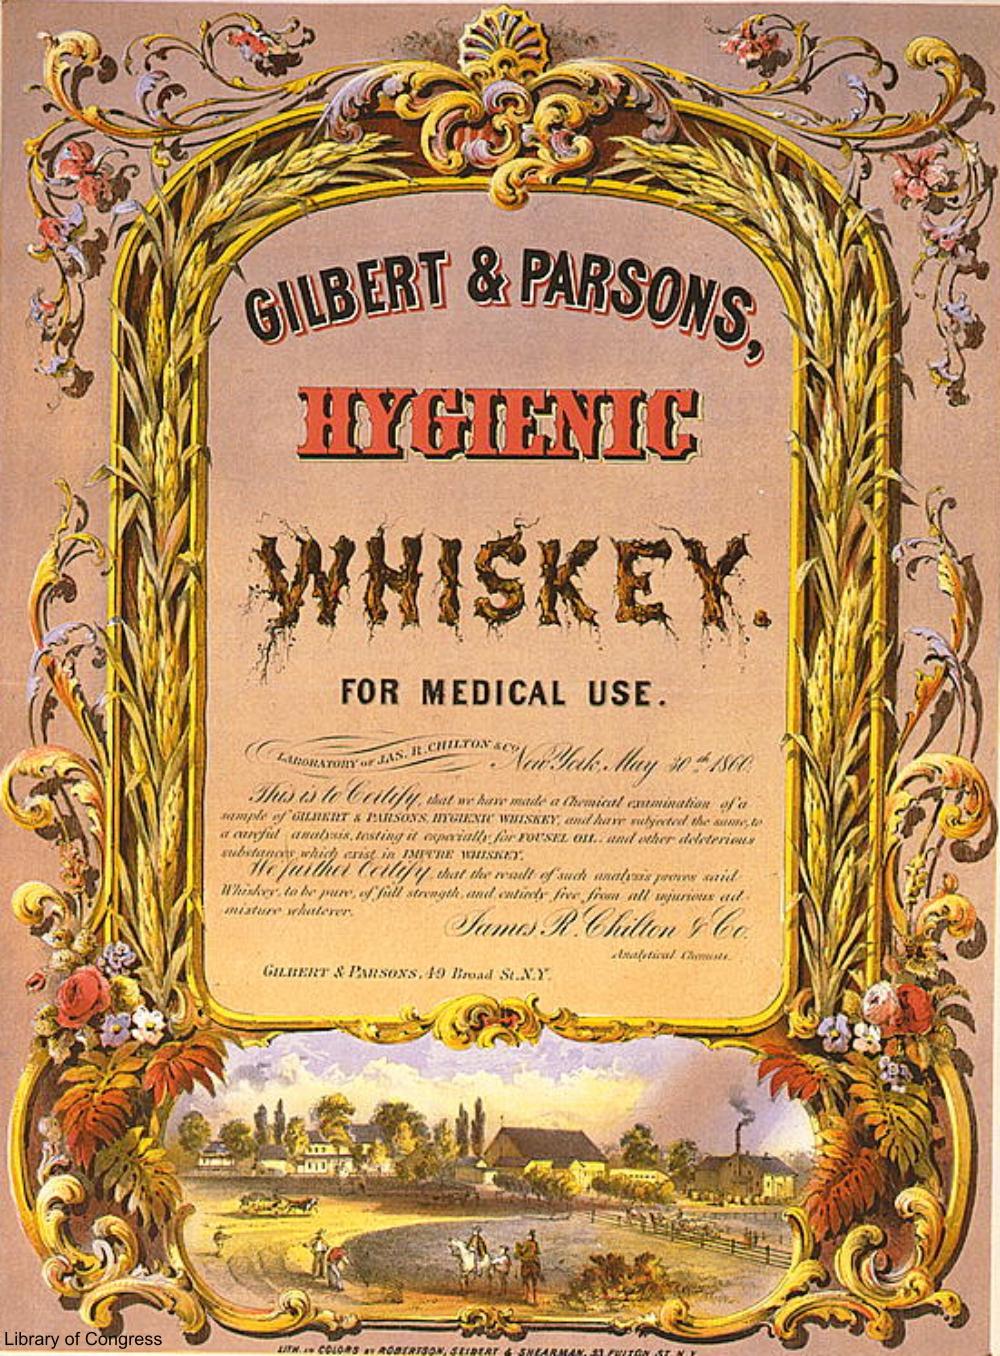 1860 Medicinal Whiskey Advertisement